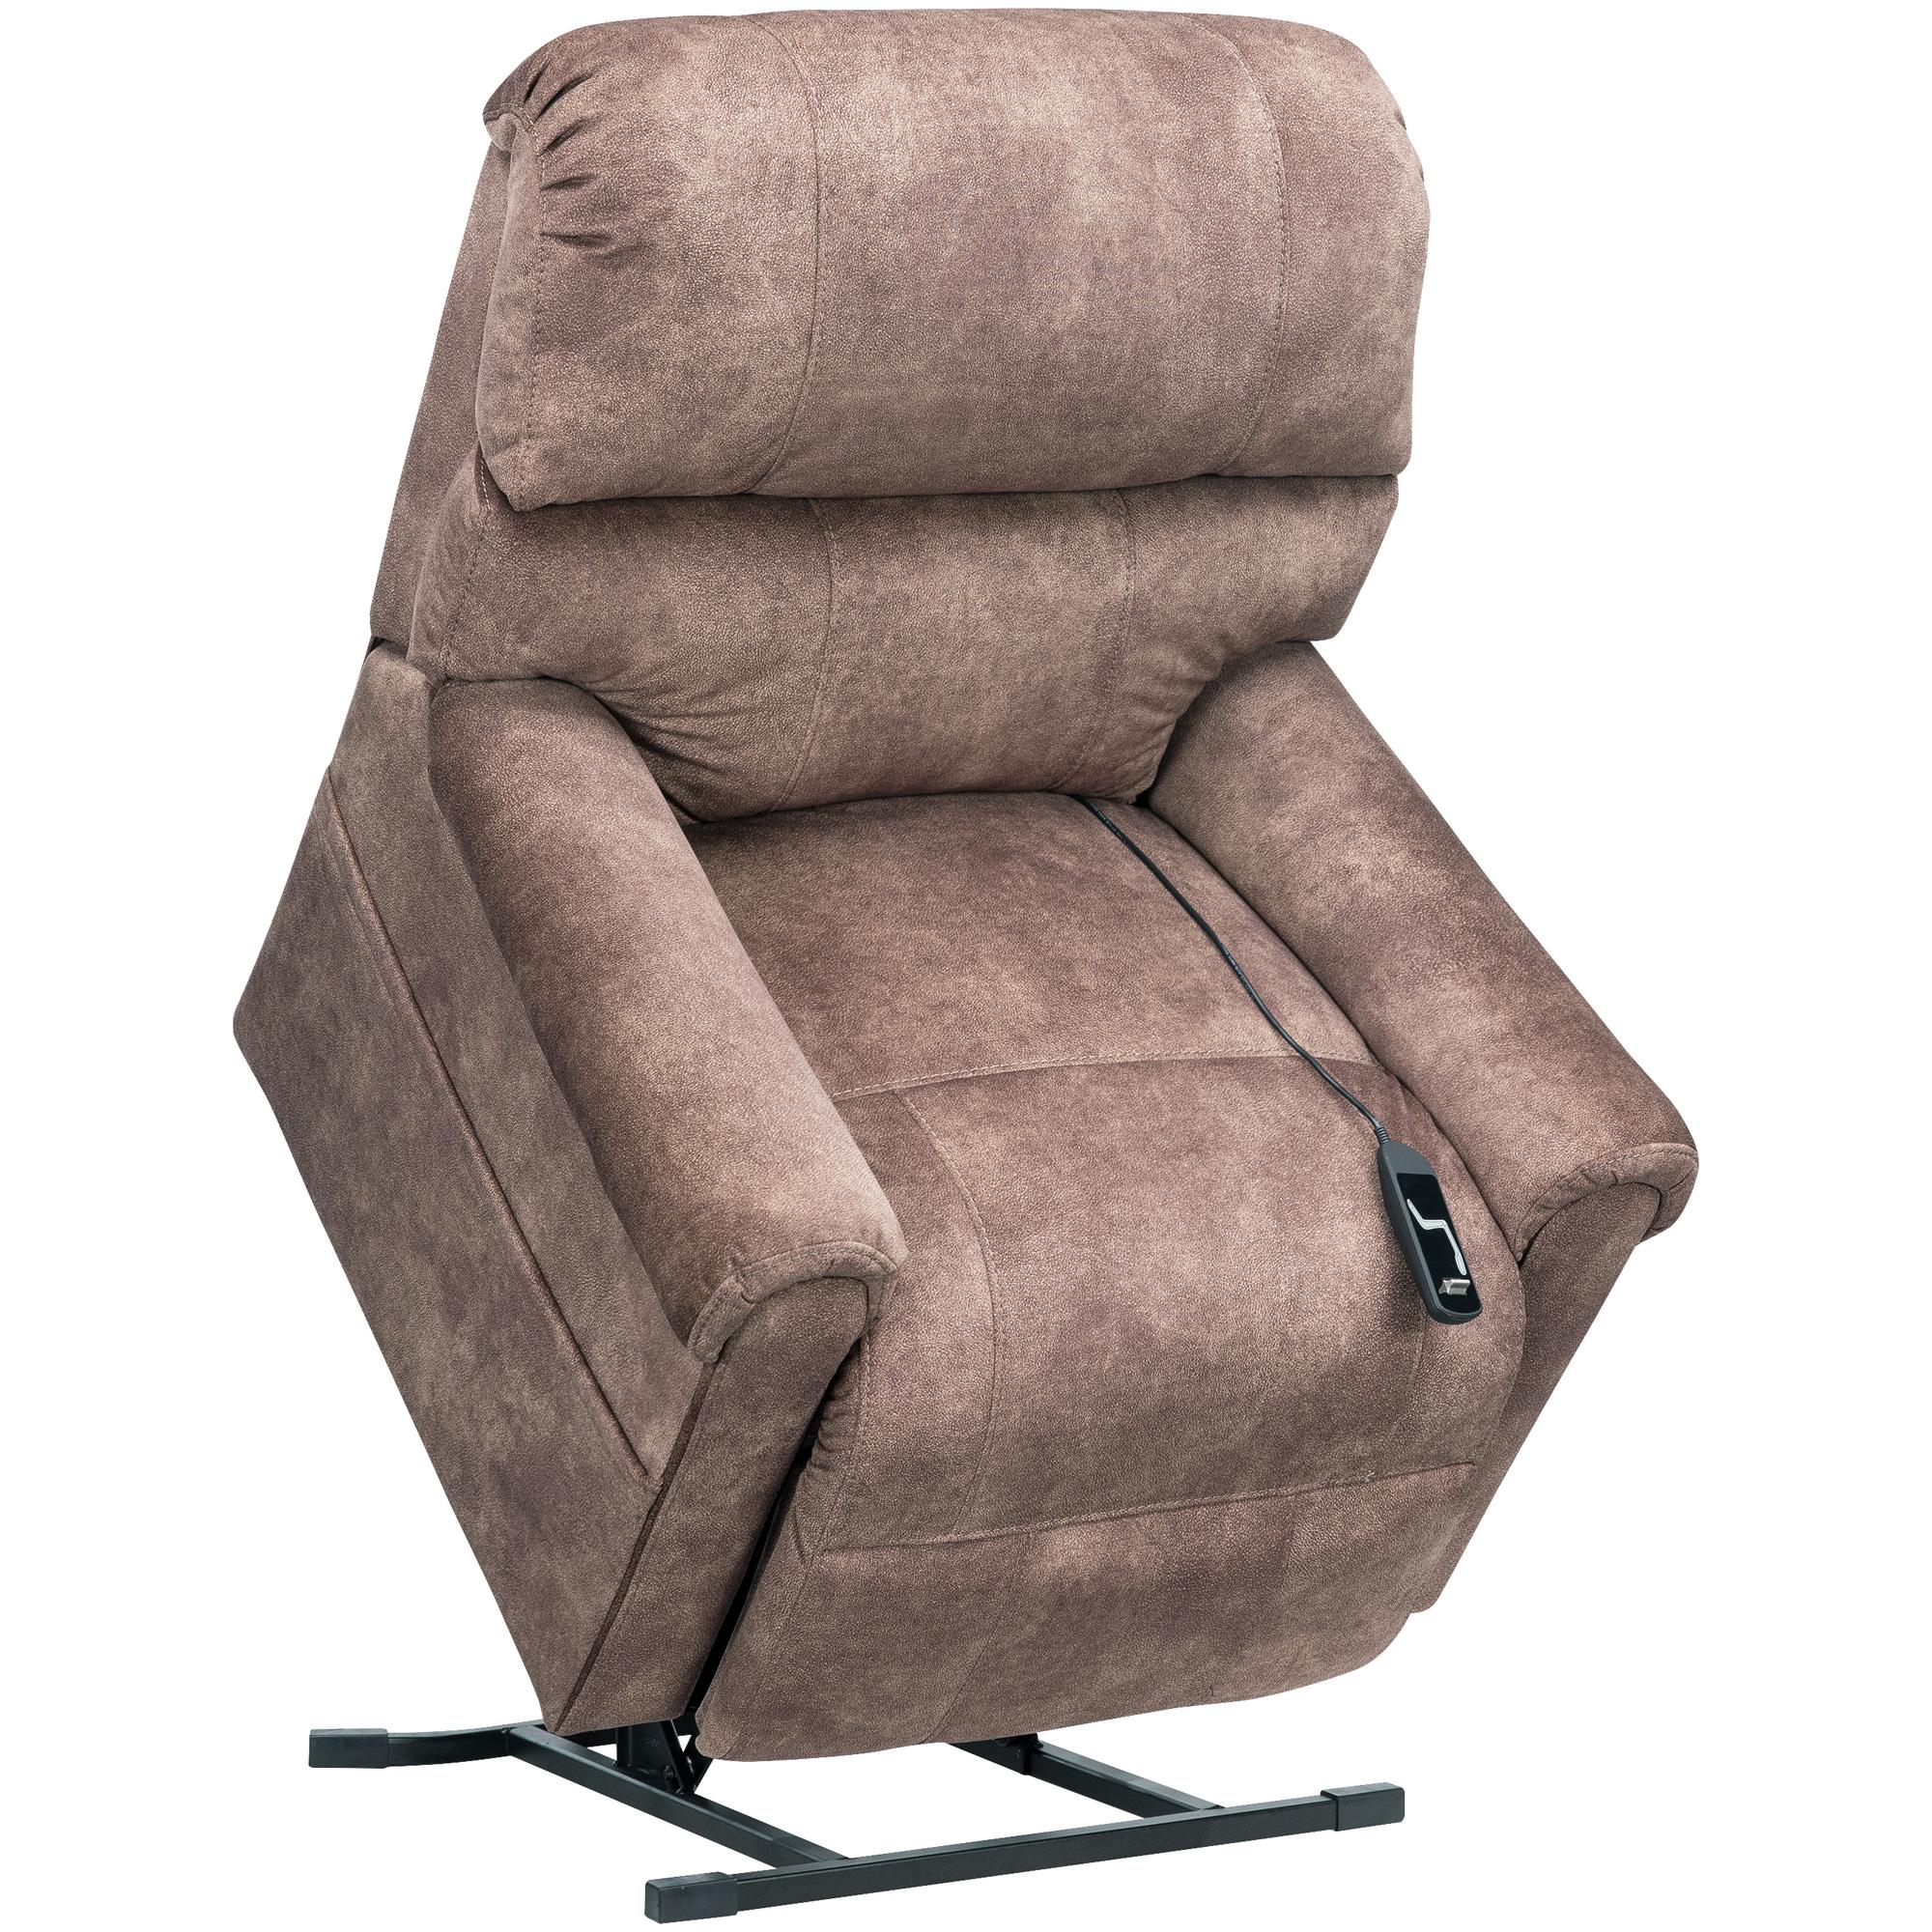 Franklin | Copper Tanner Lift Chair Recliner